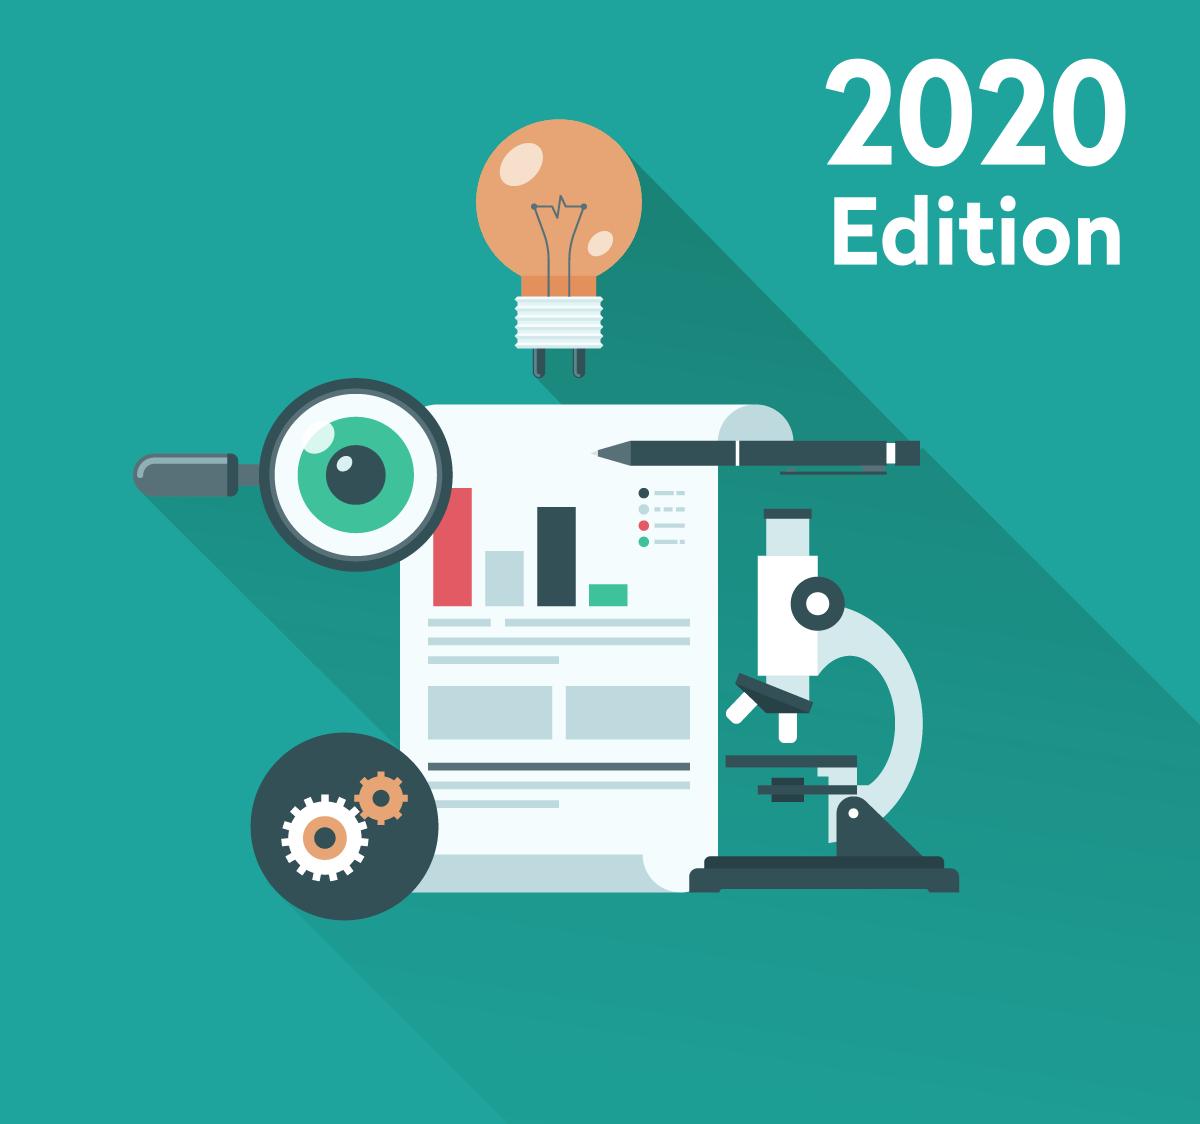 Paper-writing 2020